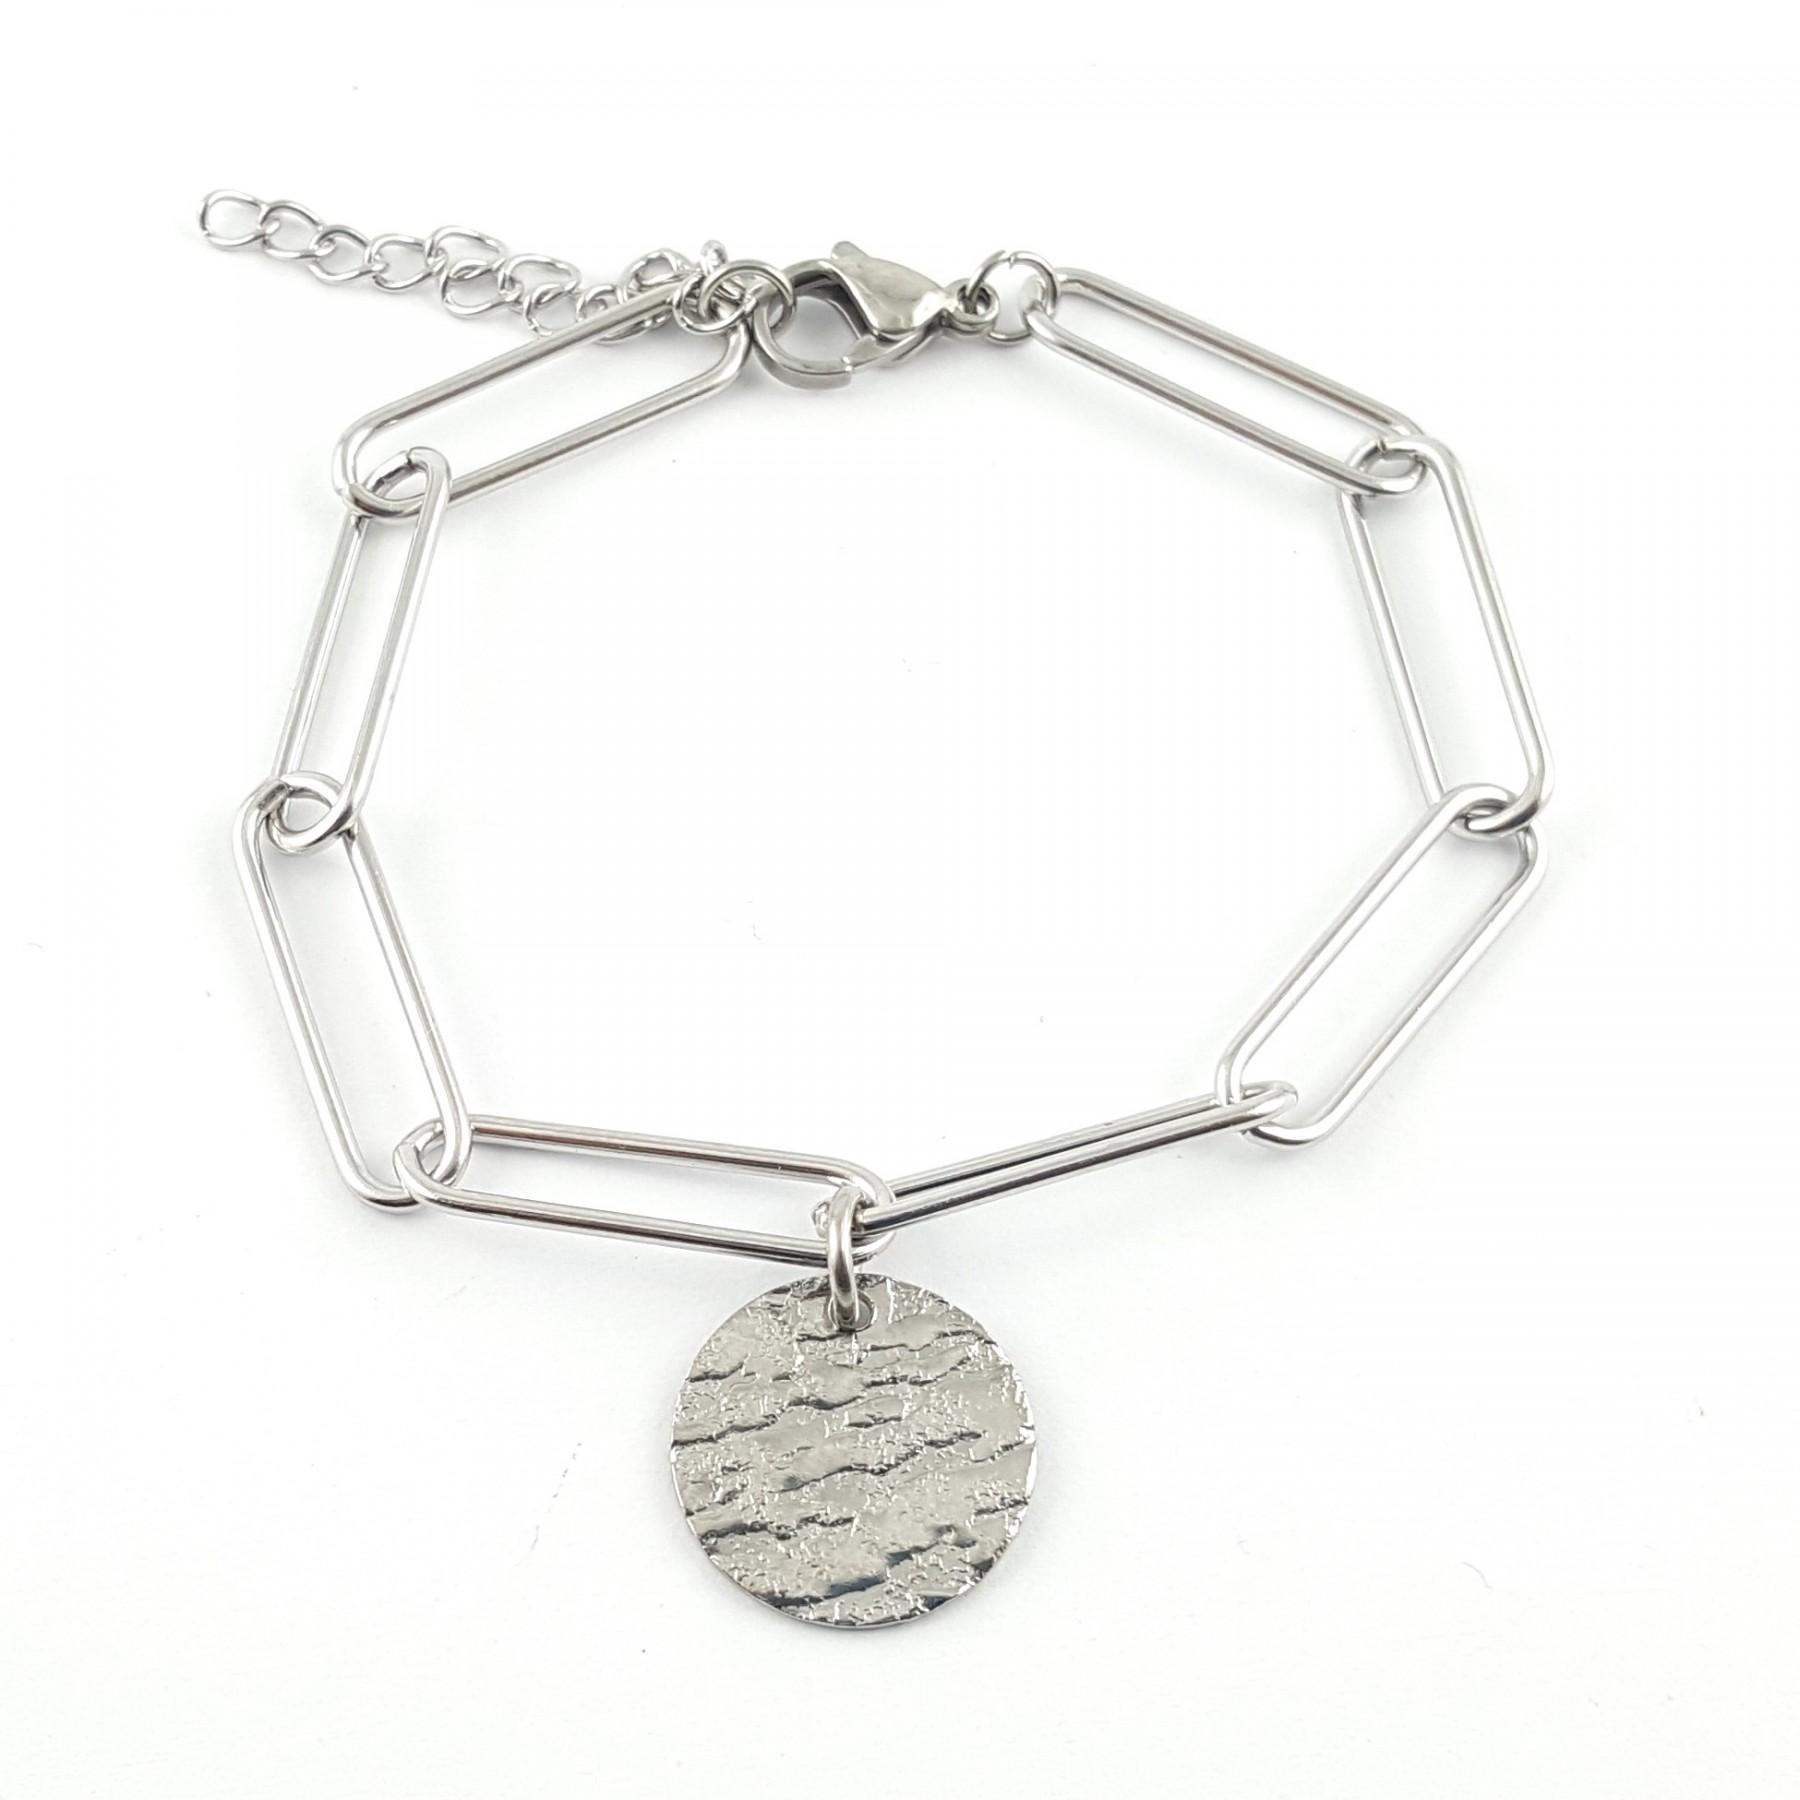 Bracelet chaîne grande maille